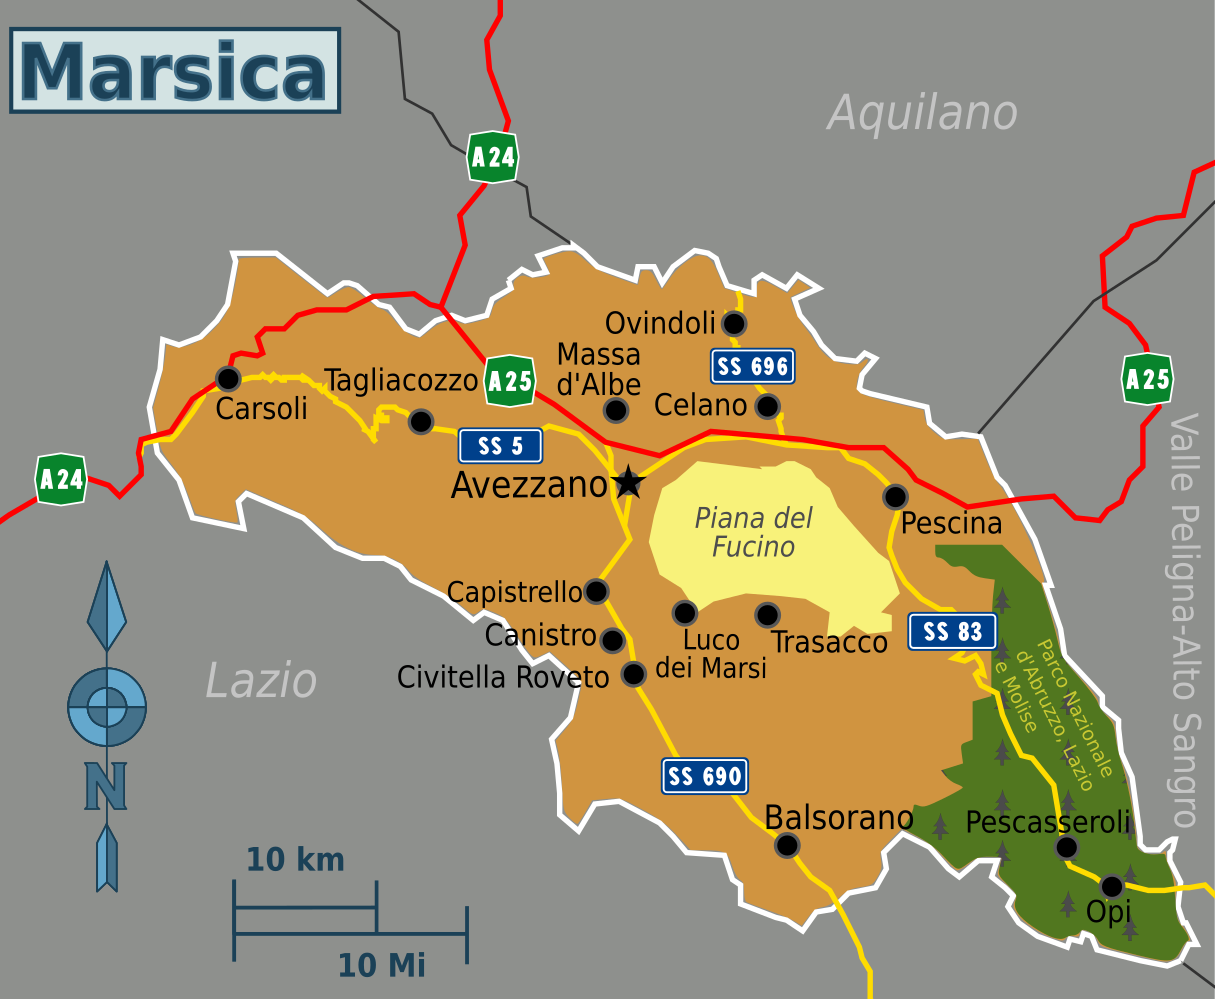 7 - Marsica